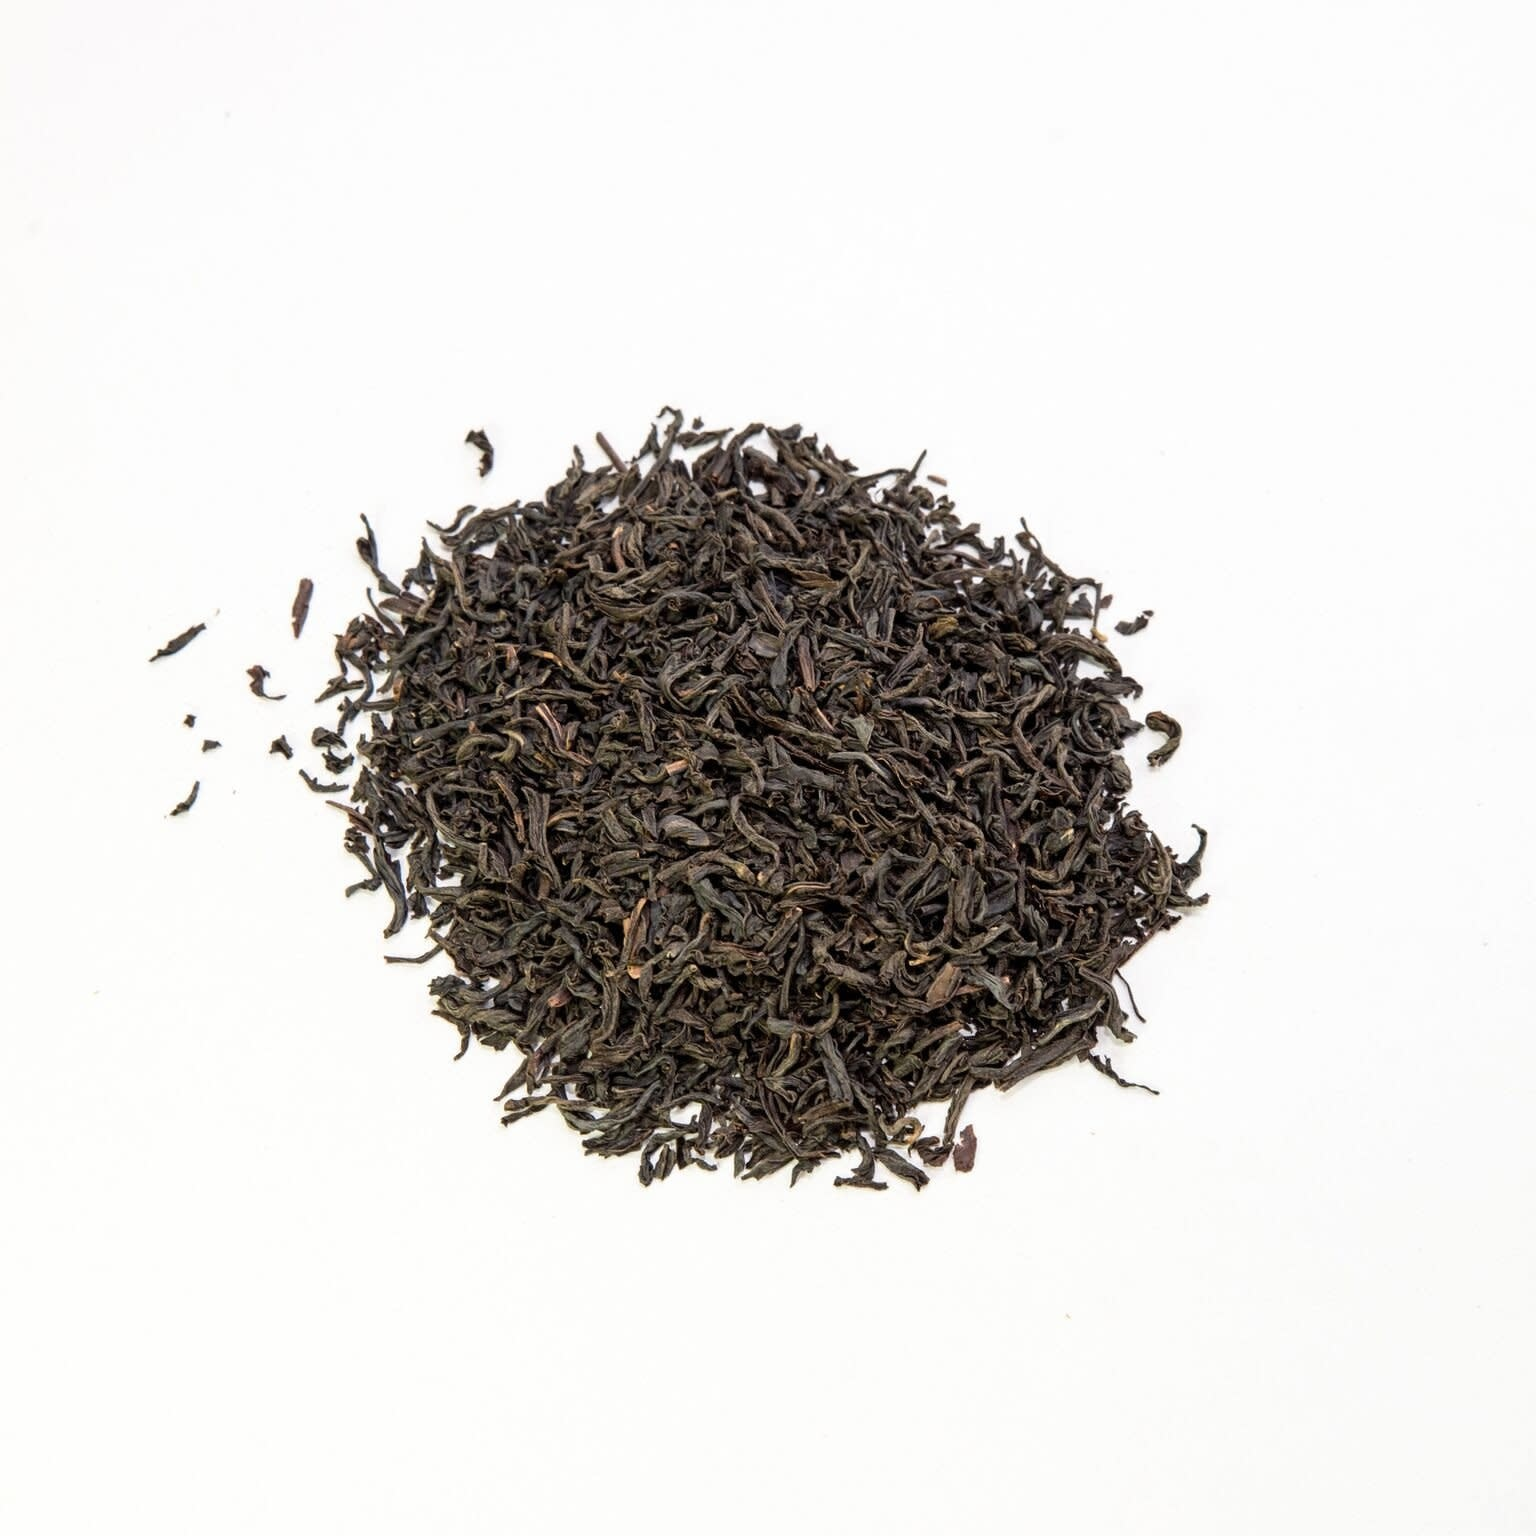 Naked Leaf Earl Grey Bulk Tea 50g